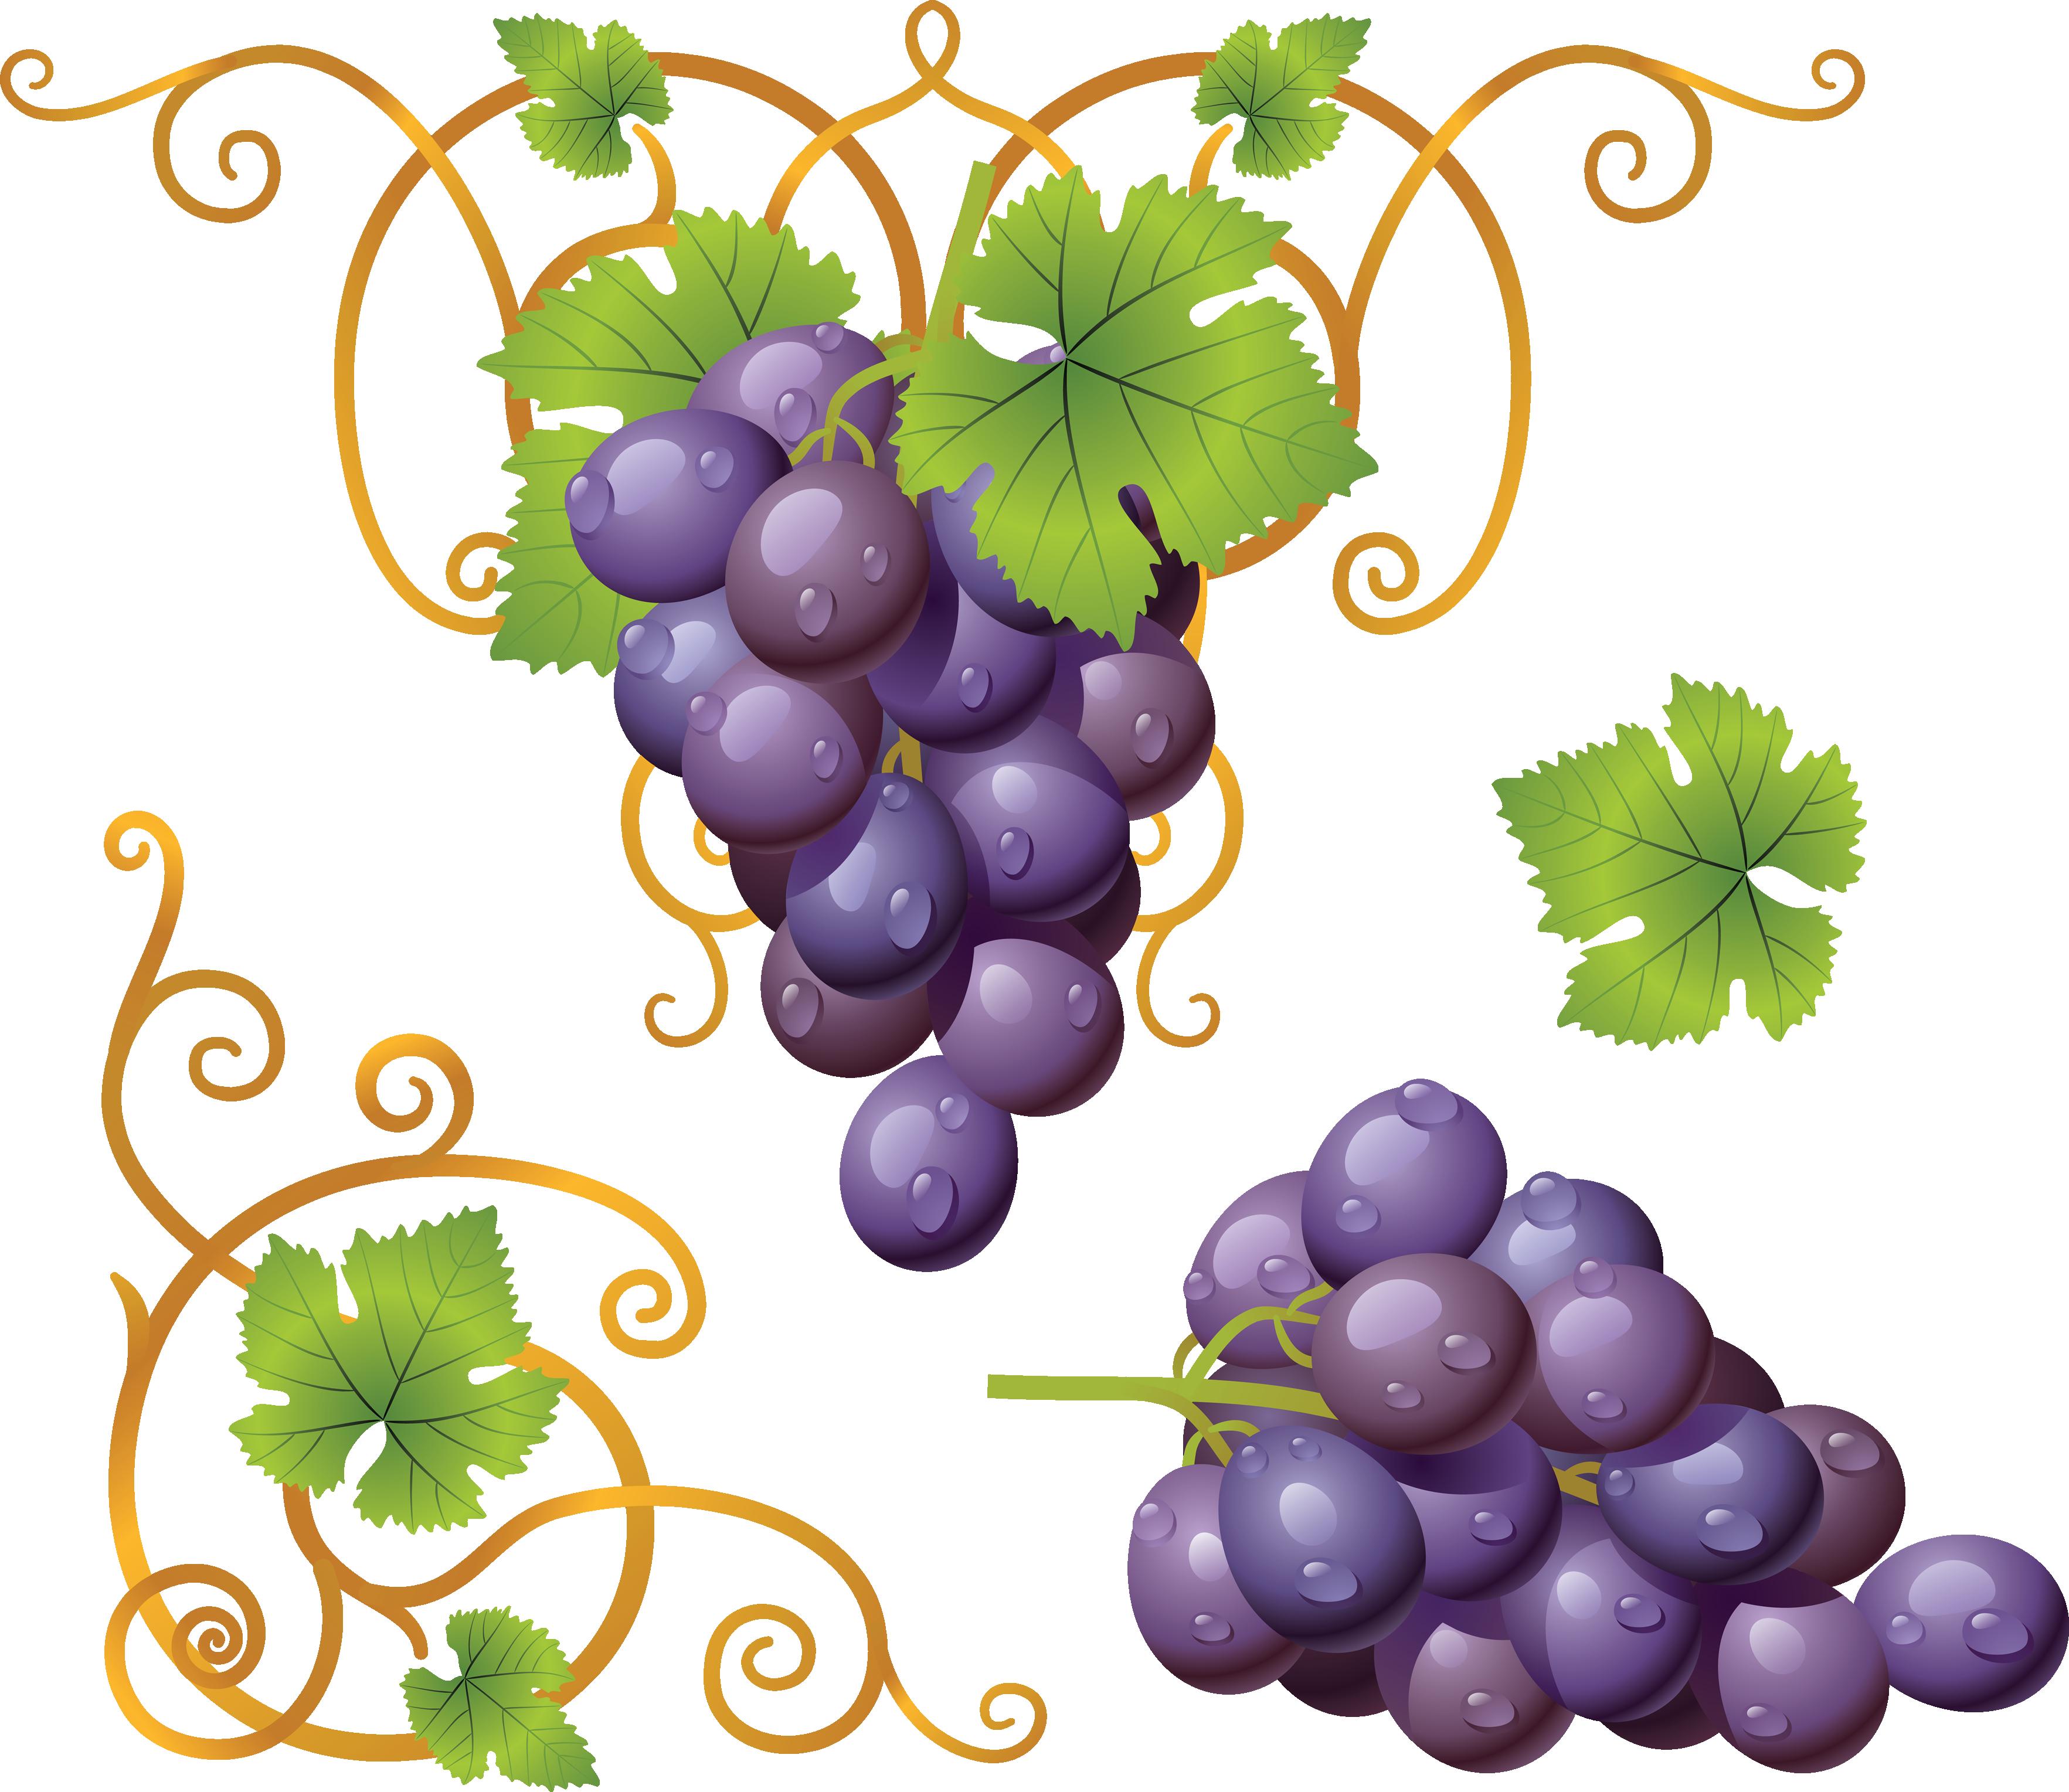 e a ba. Grape clipart pacman fruit